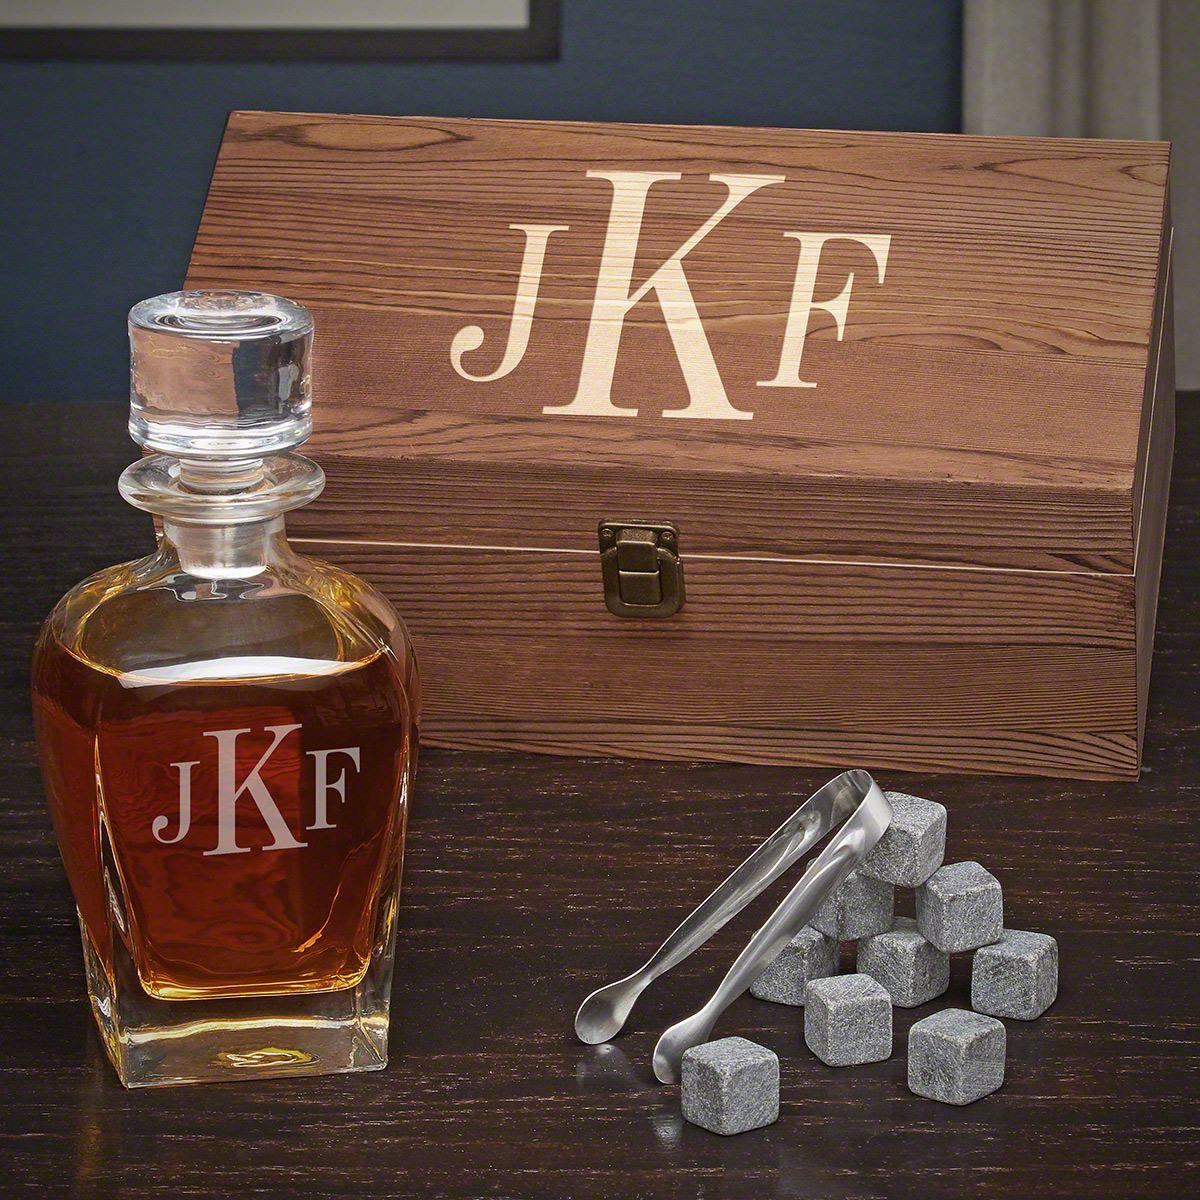 Classic Monogram Personalized Whiskey Draper Decanter Set